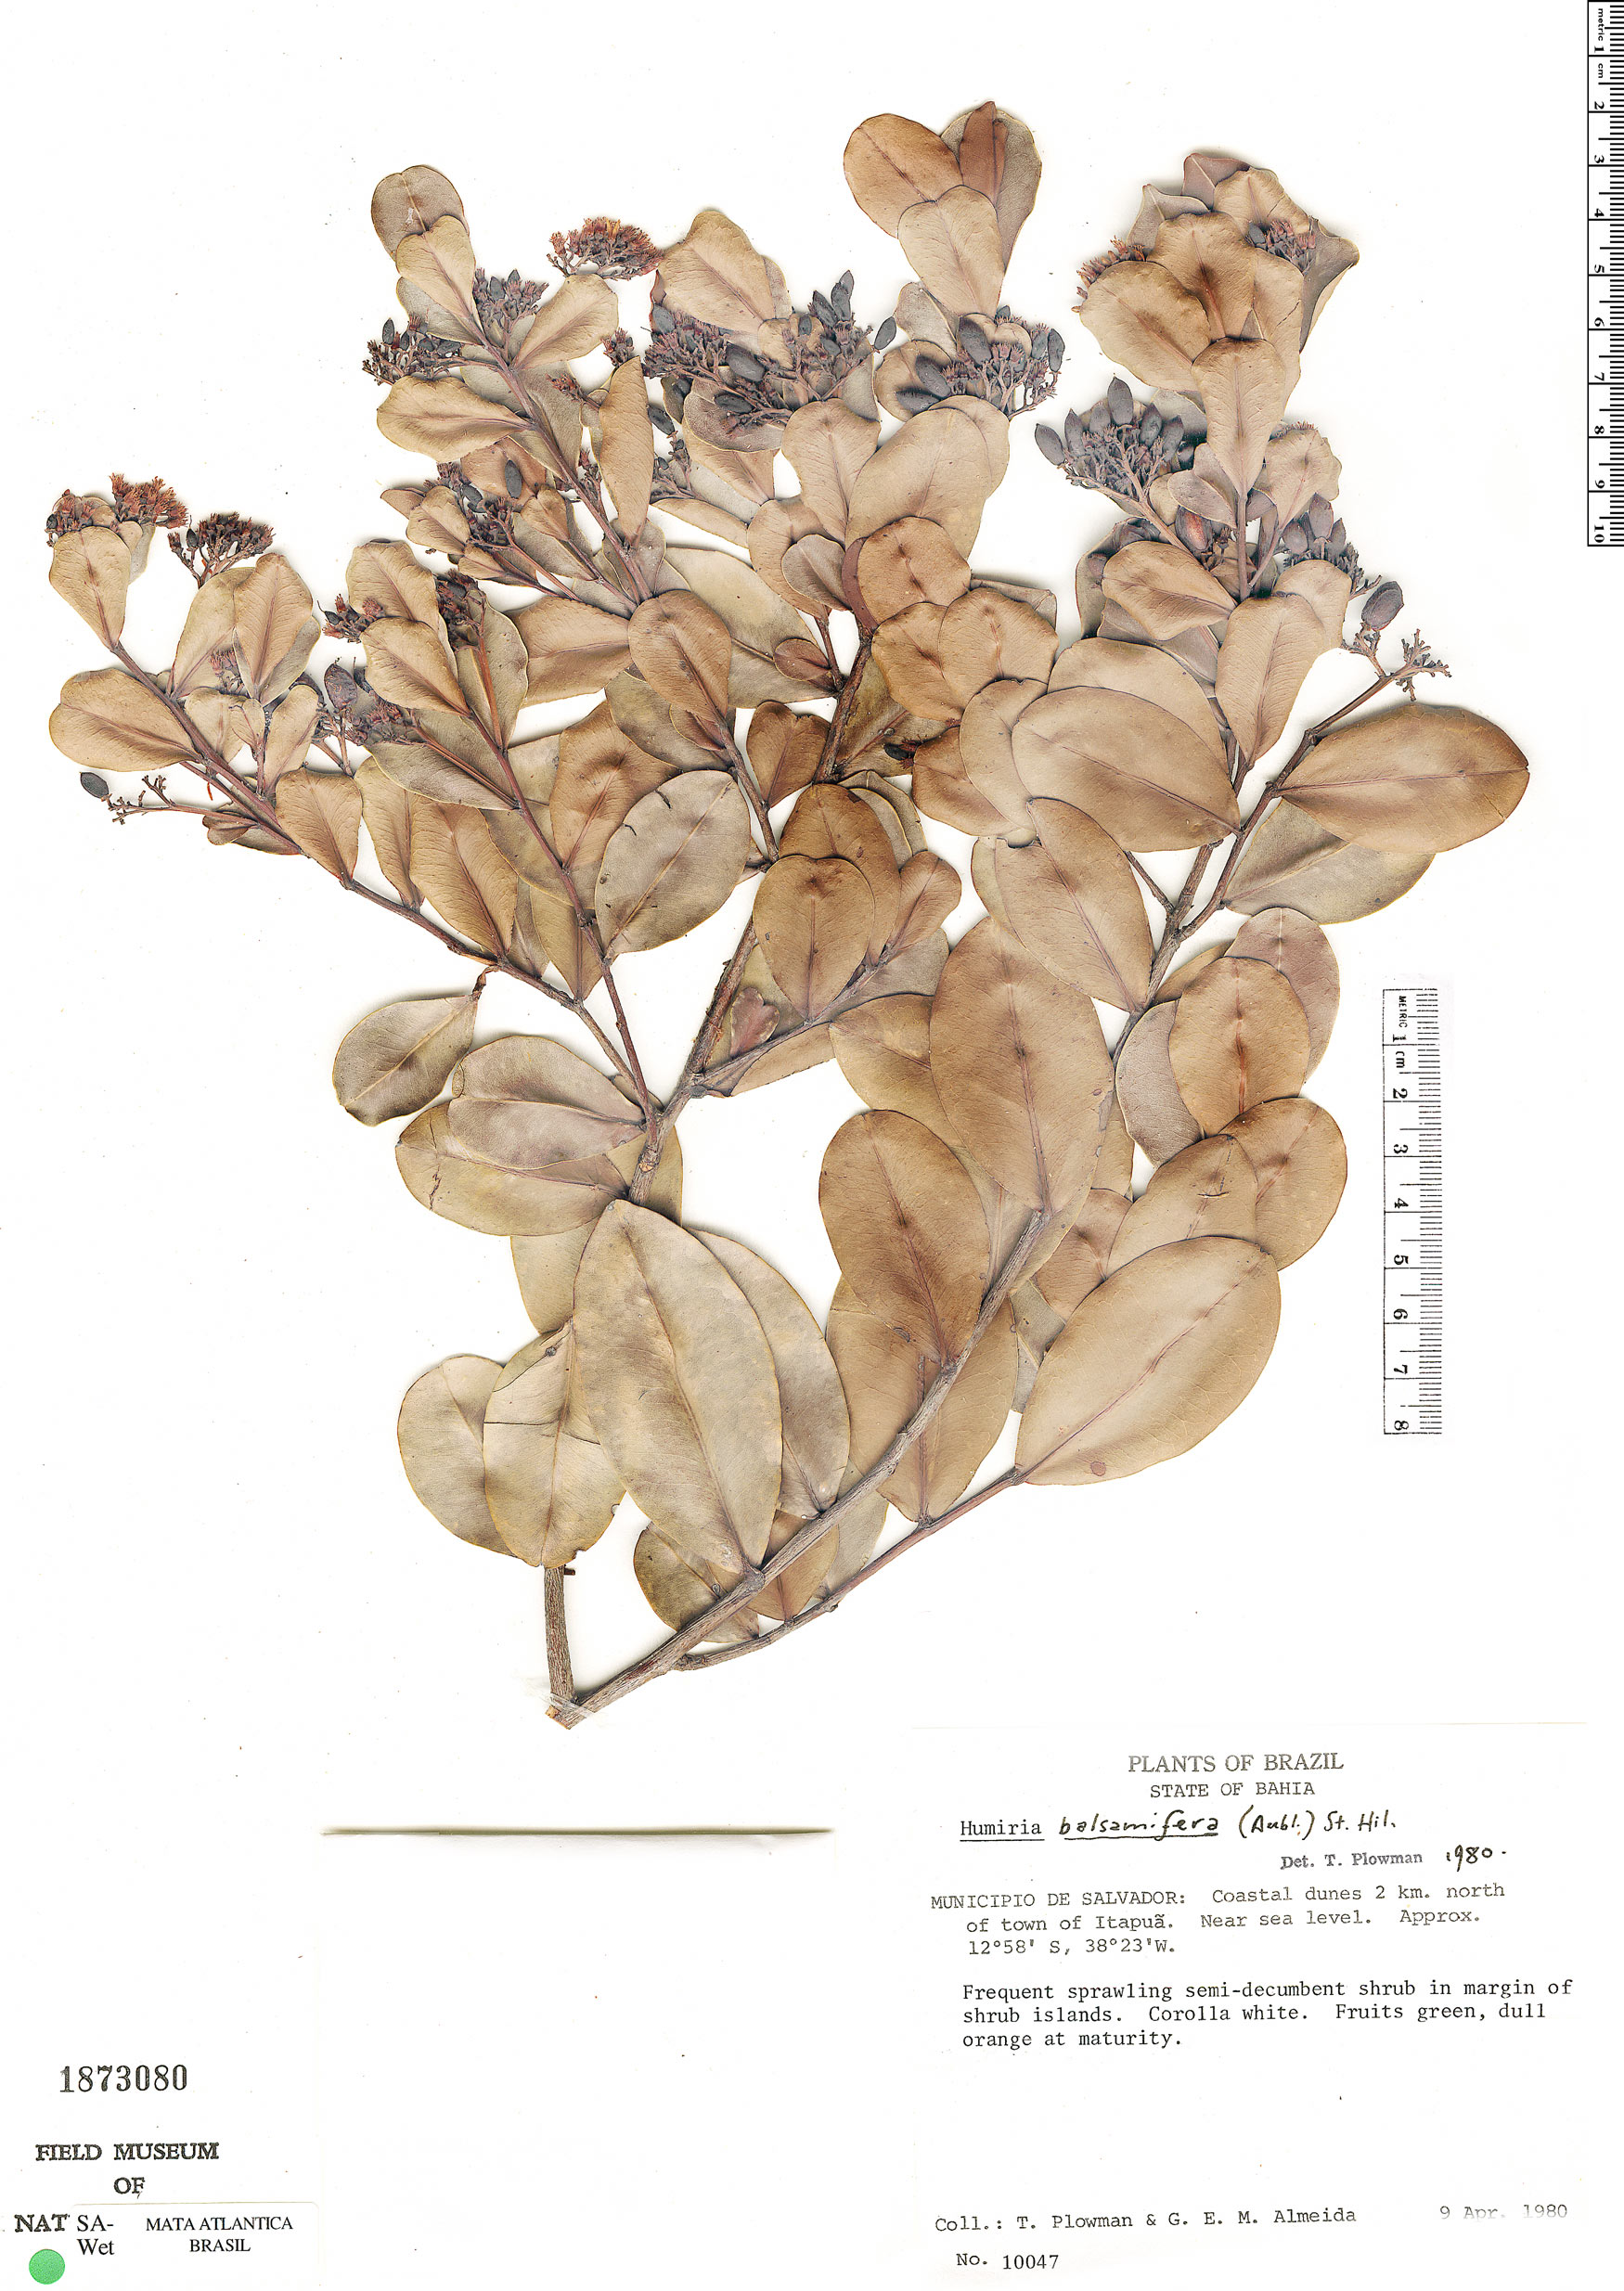 Specimen: Humiria balsamifera